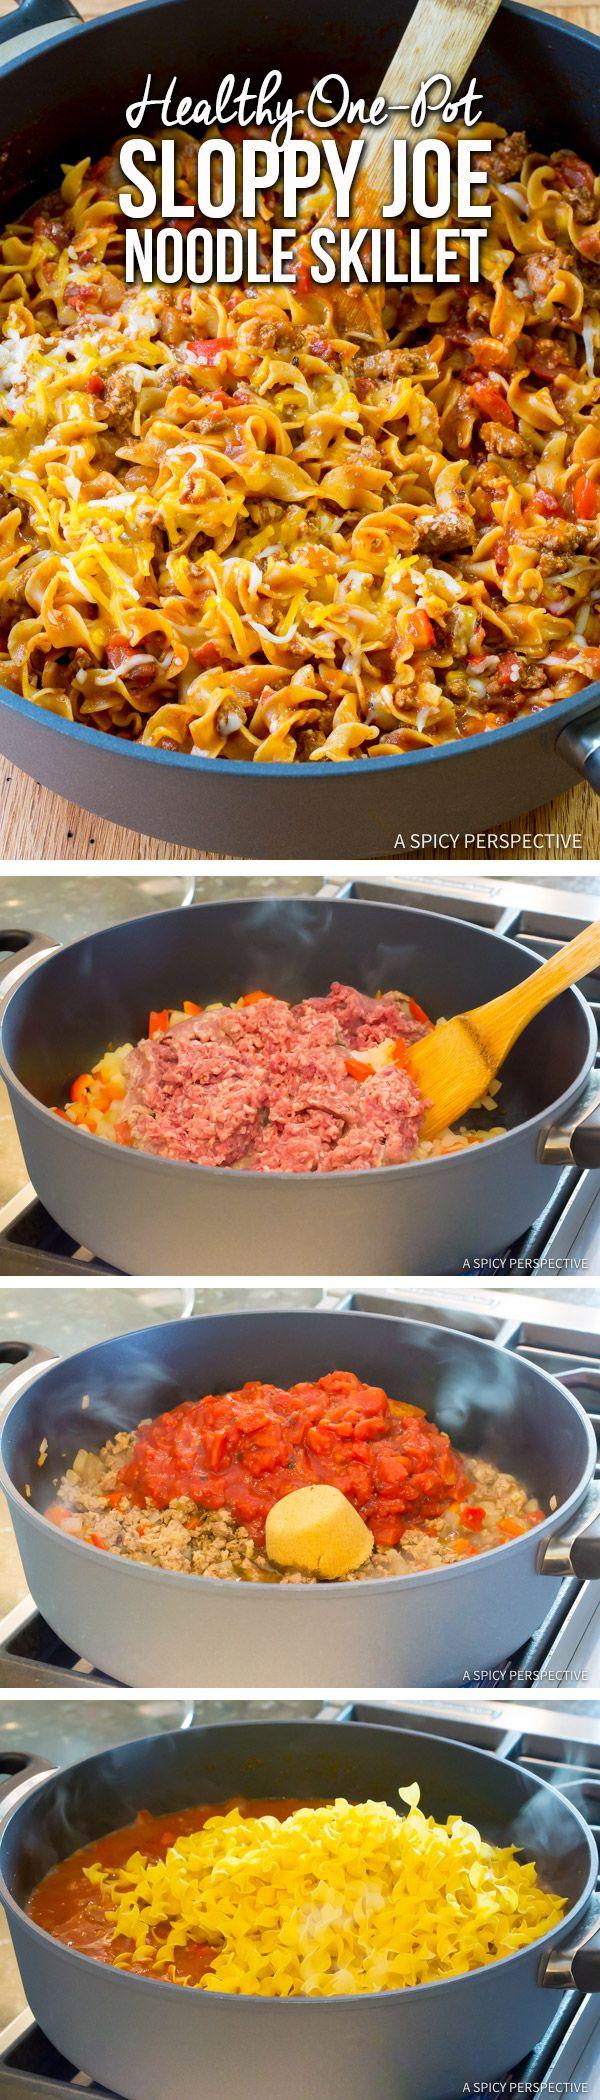 Healthified One-Pot Sloppy Joe Noodle Skillet | ASpicyPerspective.com via @spicyperspectiv